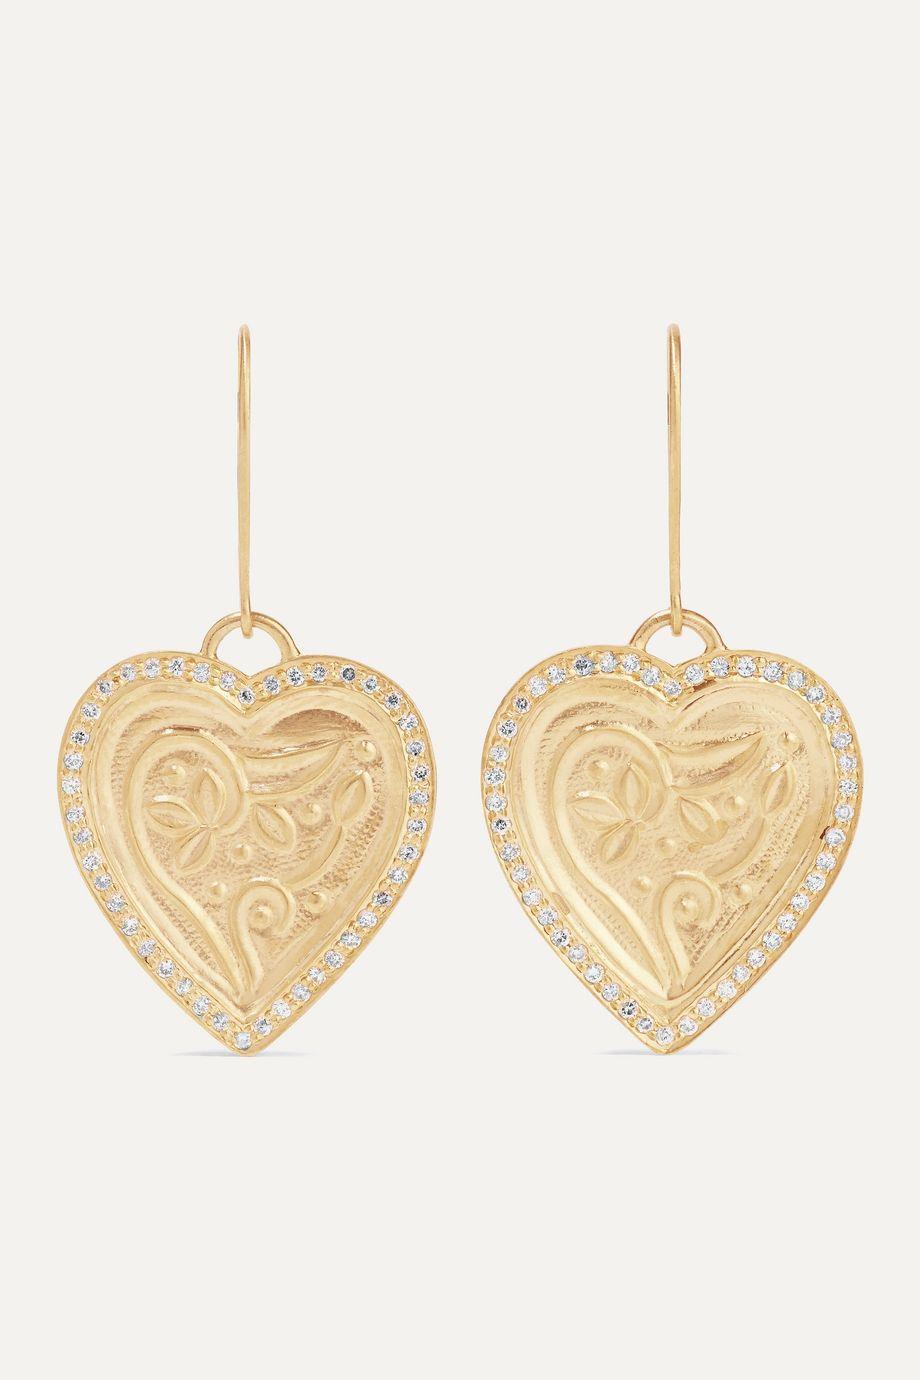 Ileana Makri Heart Beat Ohrringe aus 18 und 22 Karat Gold